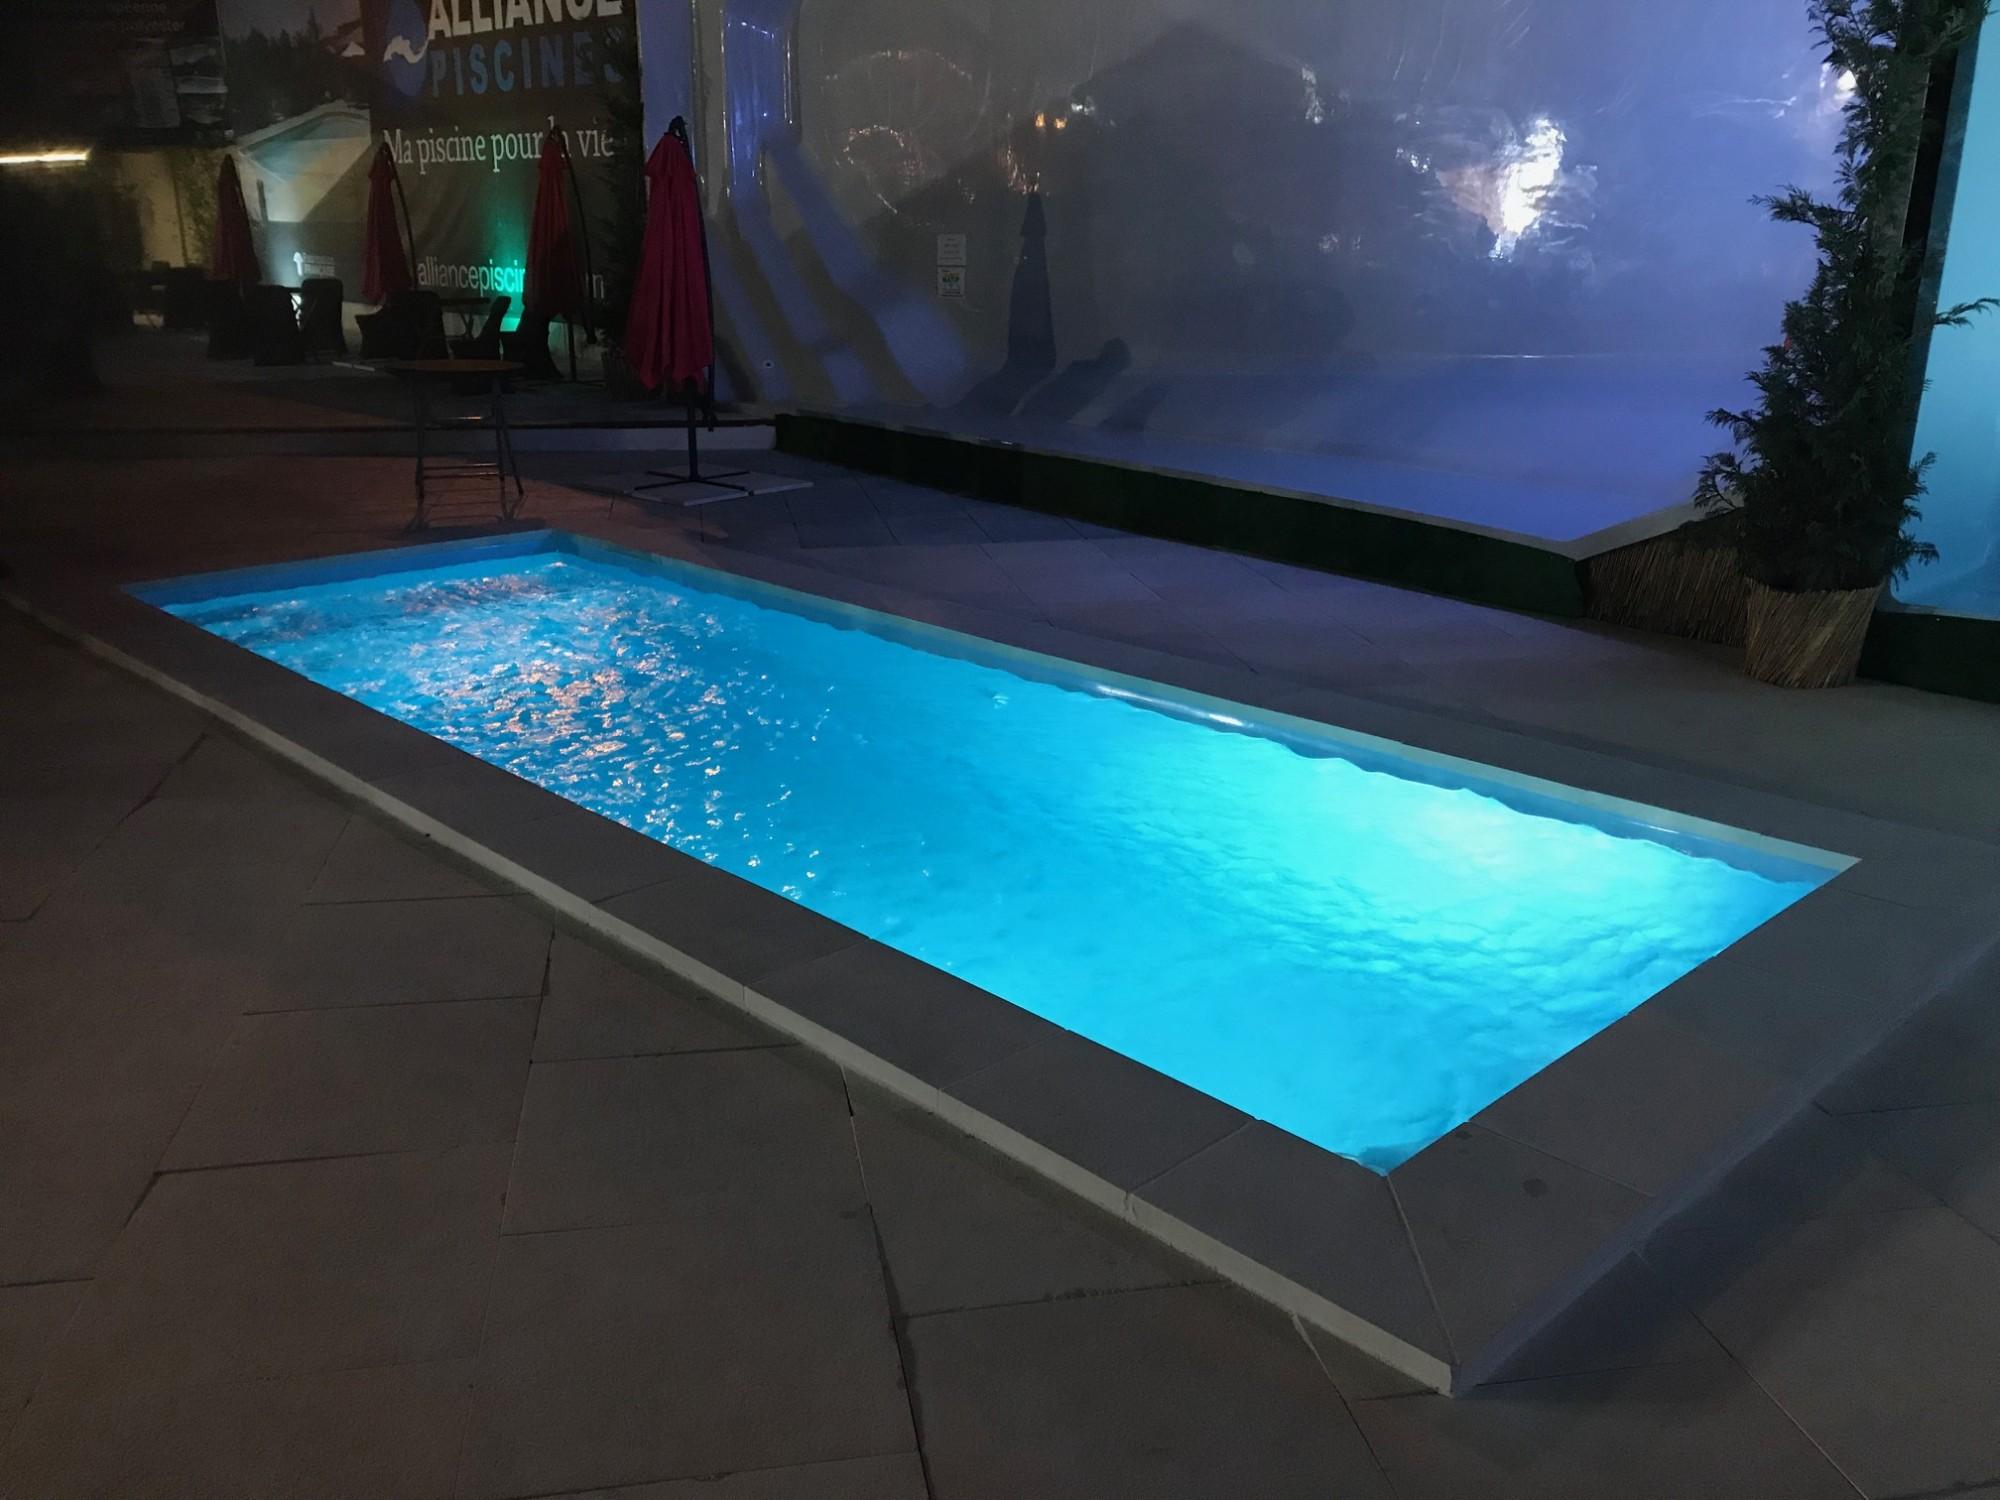 bassin de nage starlite xxl couloir de nage alliance piscines toulon magasin et installation. Black Bedroom Furniture Sets. Home Design Ideas